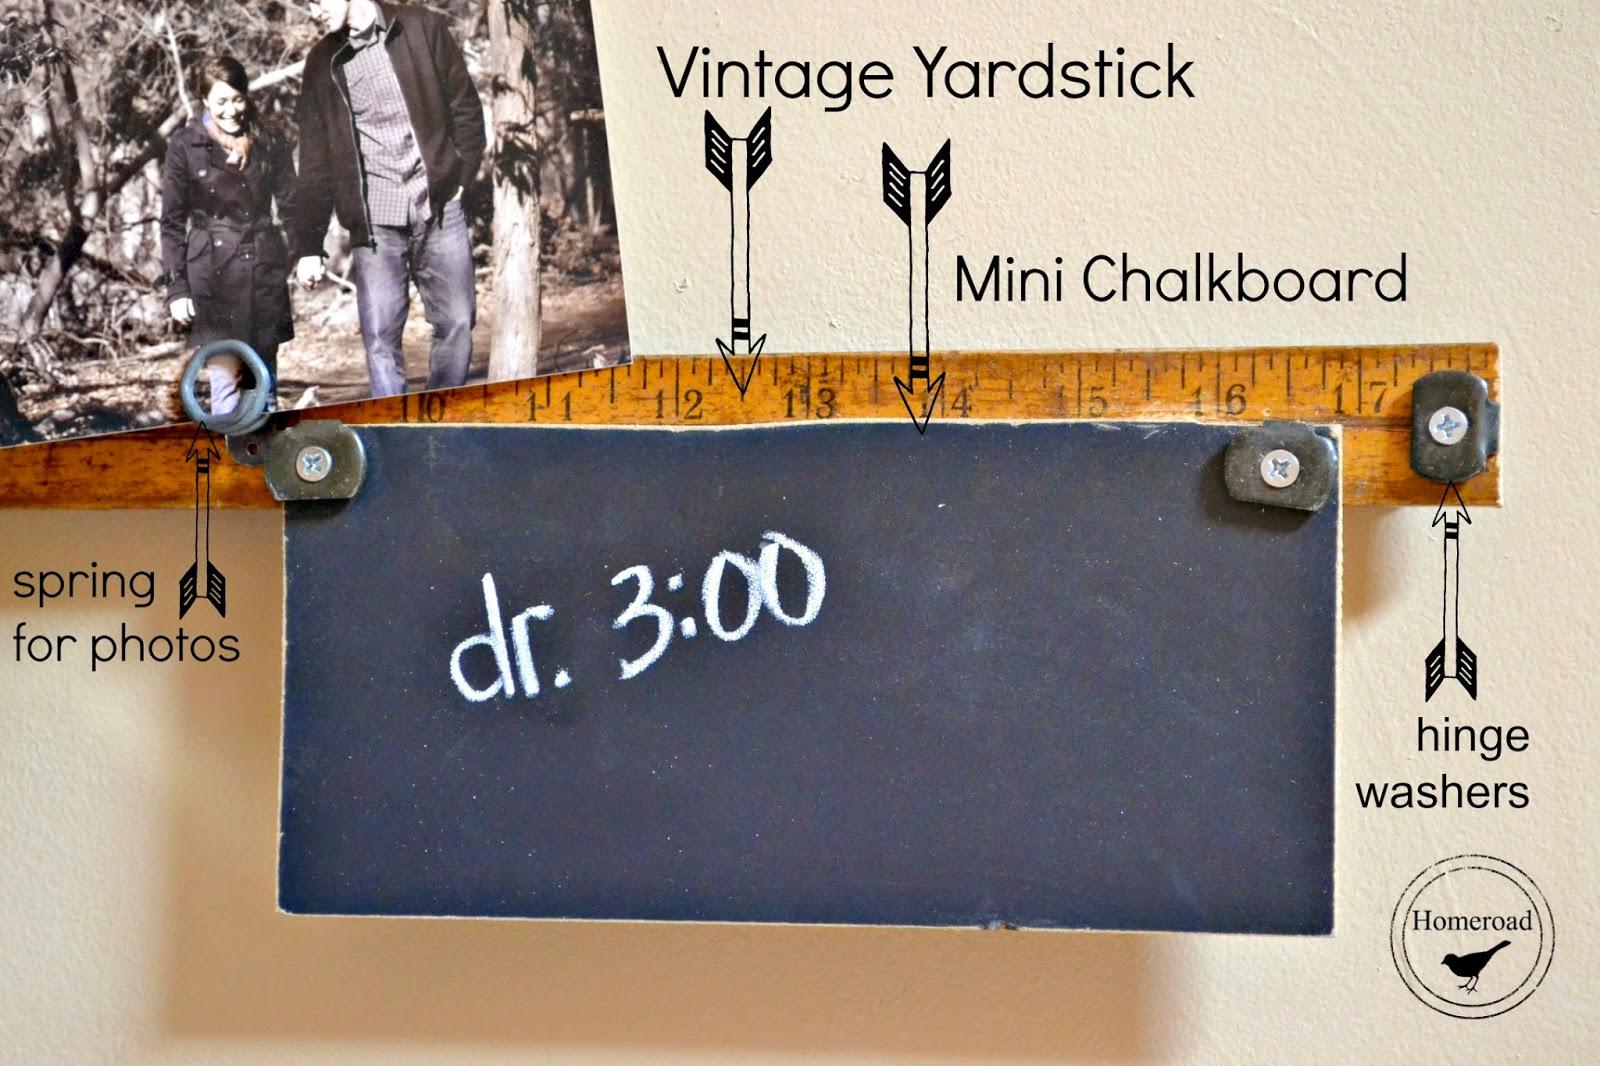 DIY Vintage yardstick message center for a small area